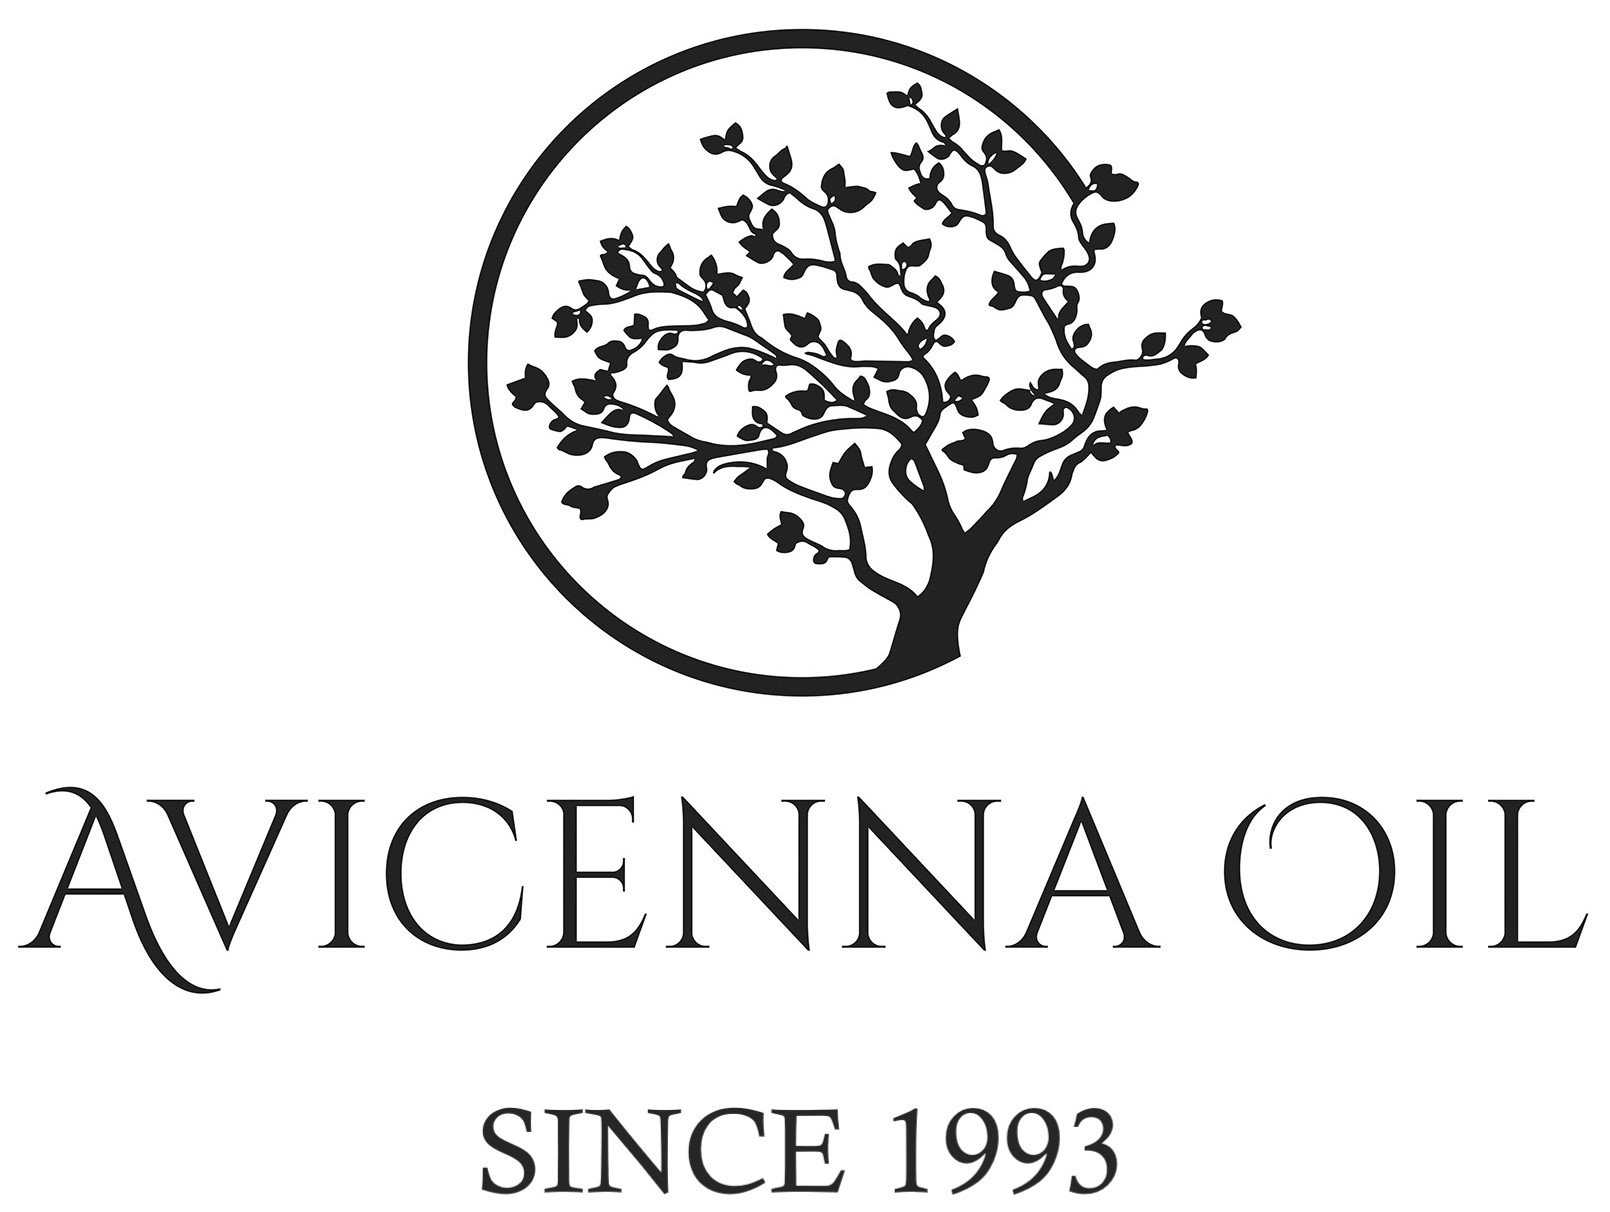 Avicenna Oil